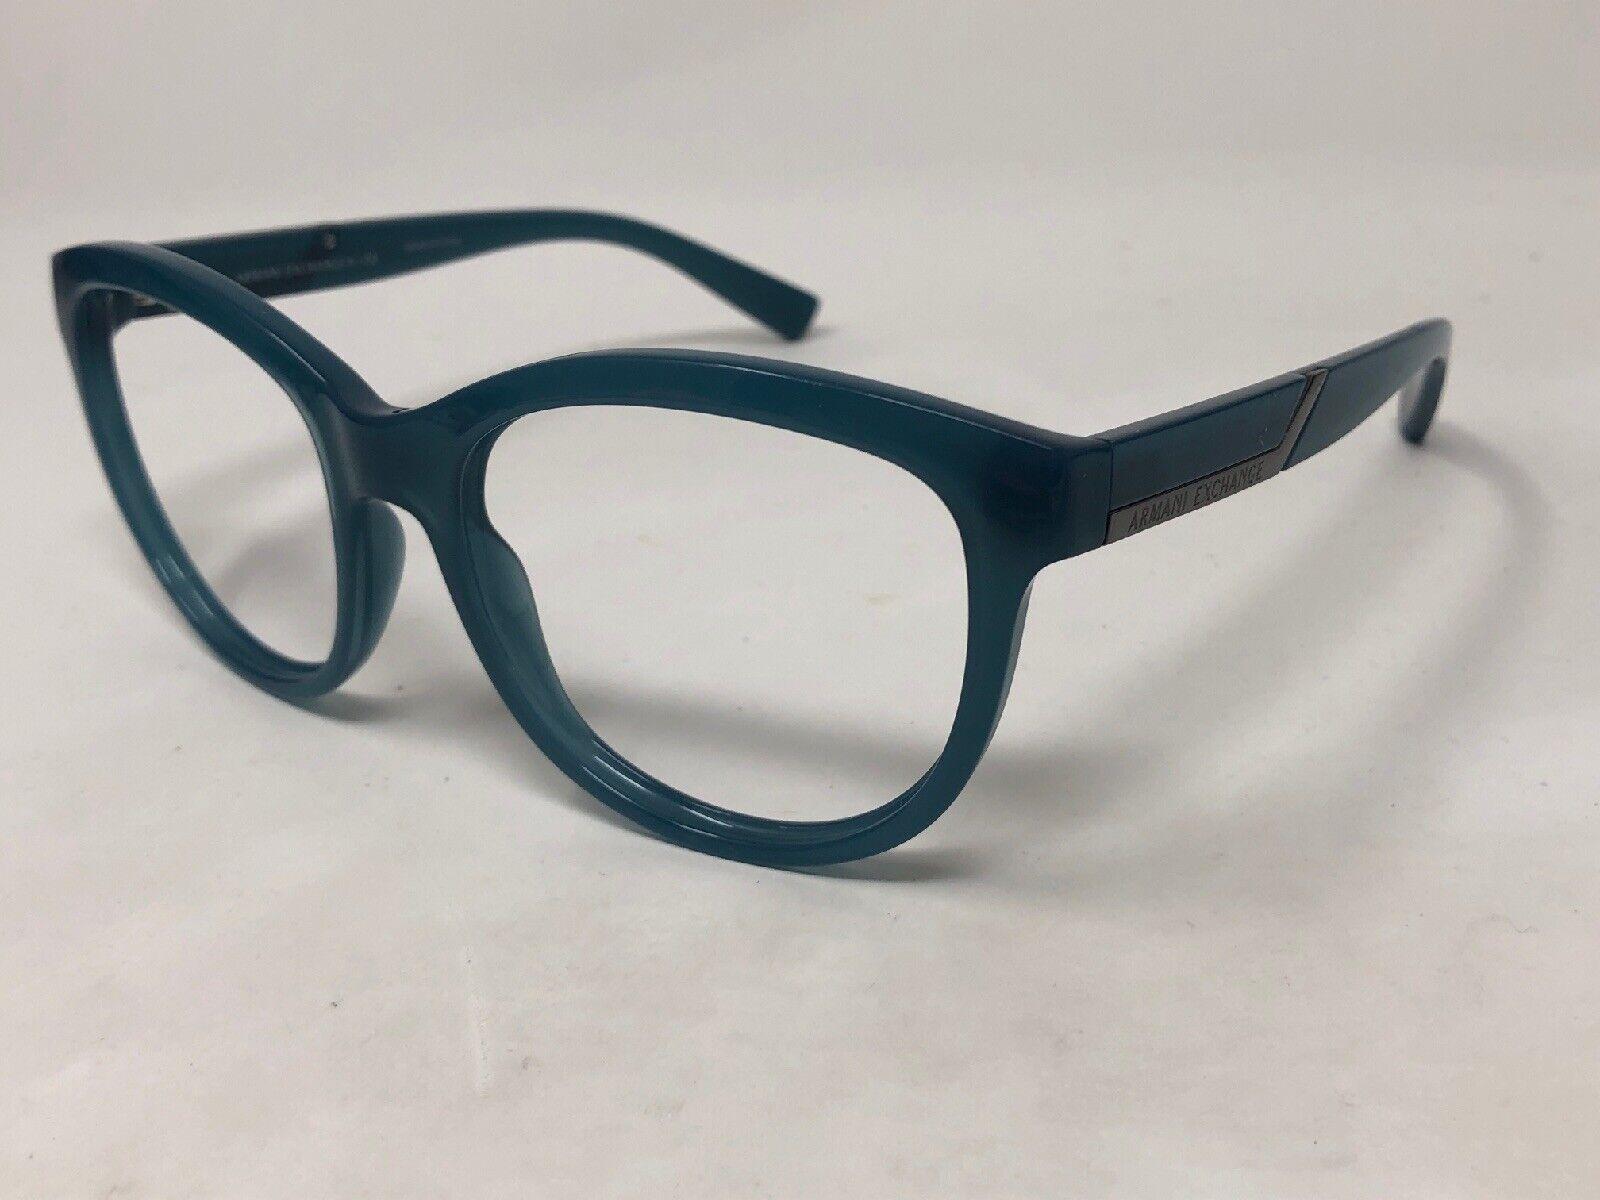 ARMANI EXCHANGE AX4051S 819011 Sunglasses Frame 55-18-140 Light Blue Clear HV87